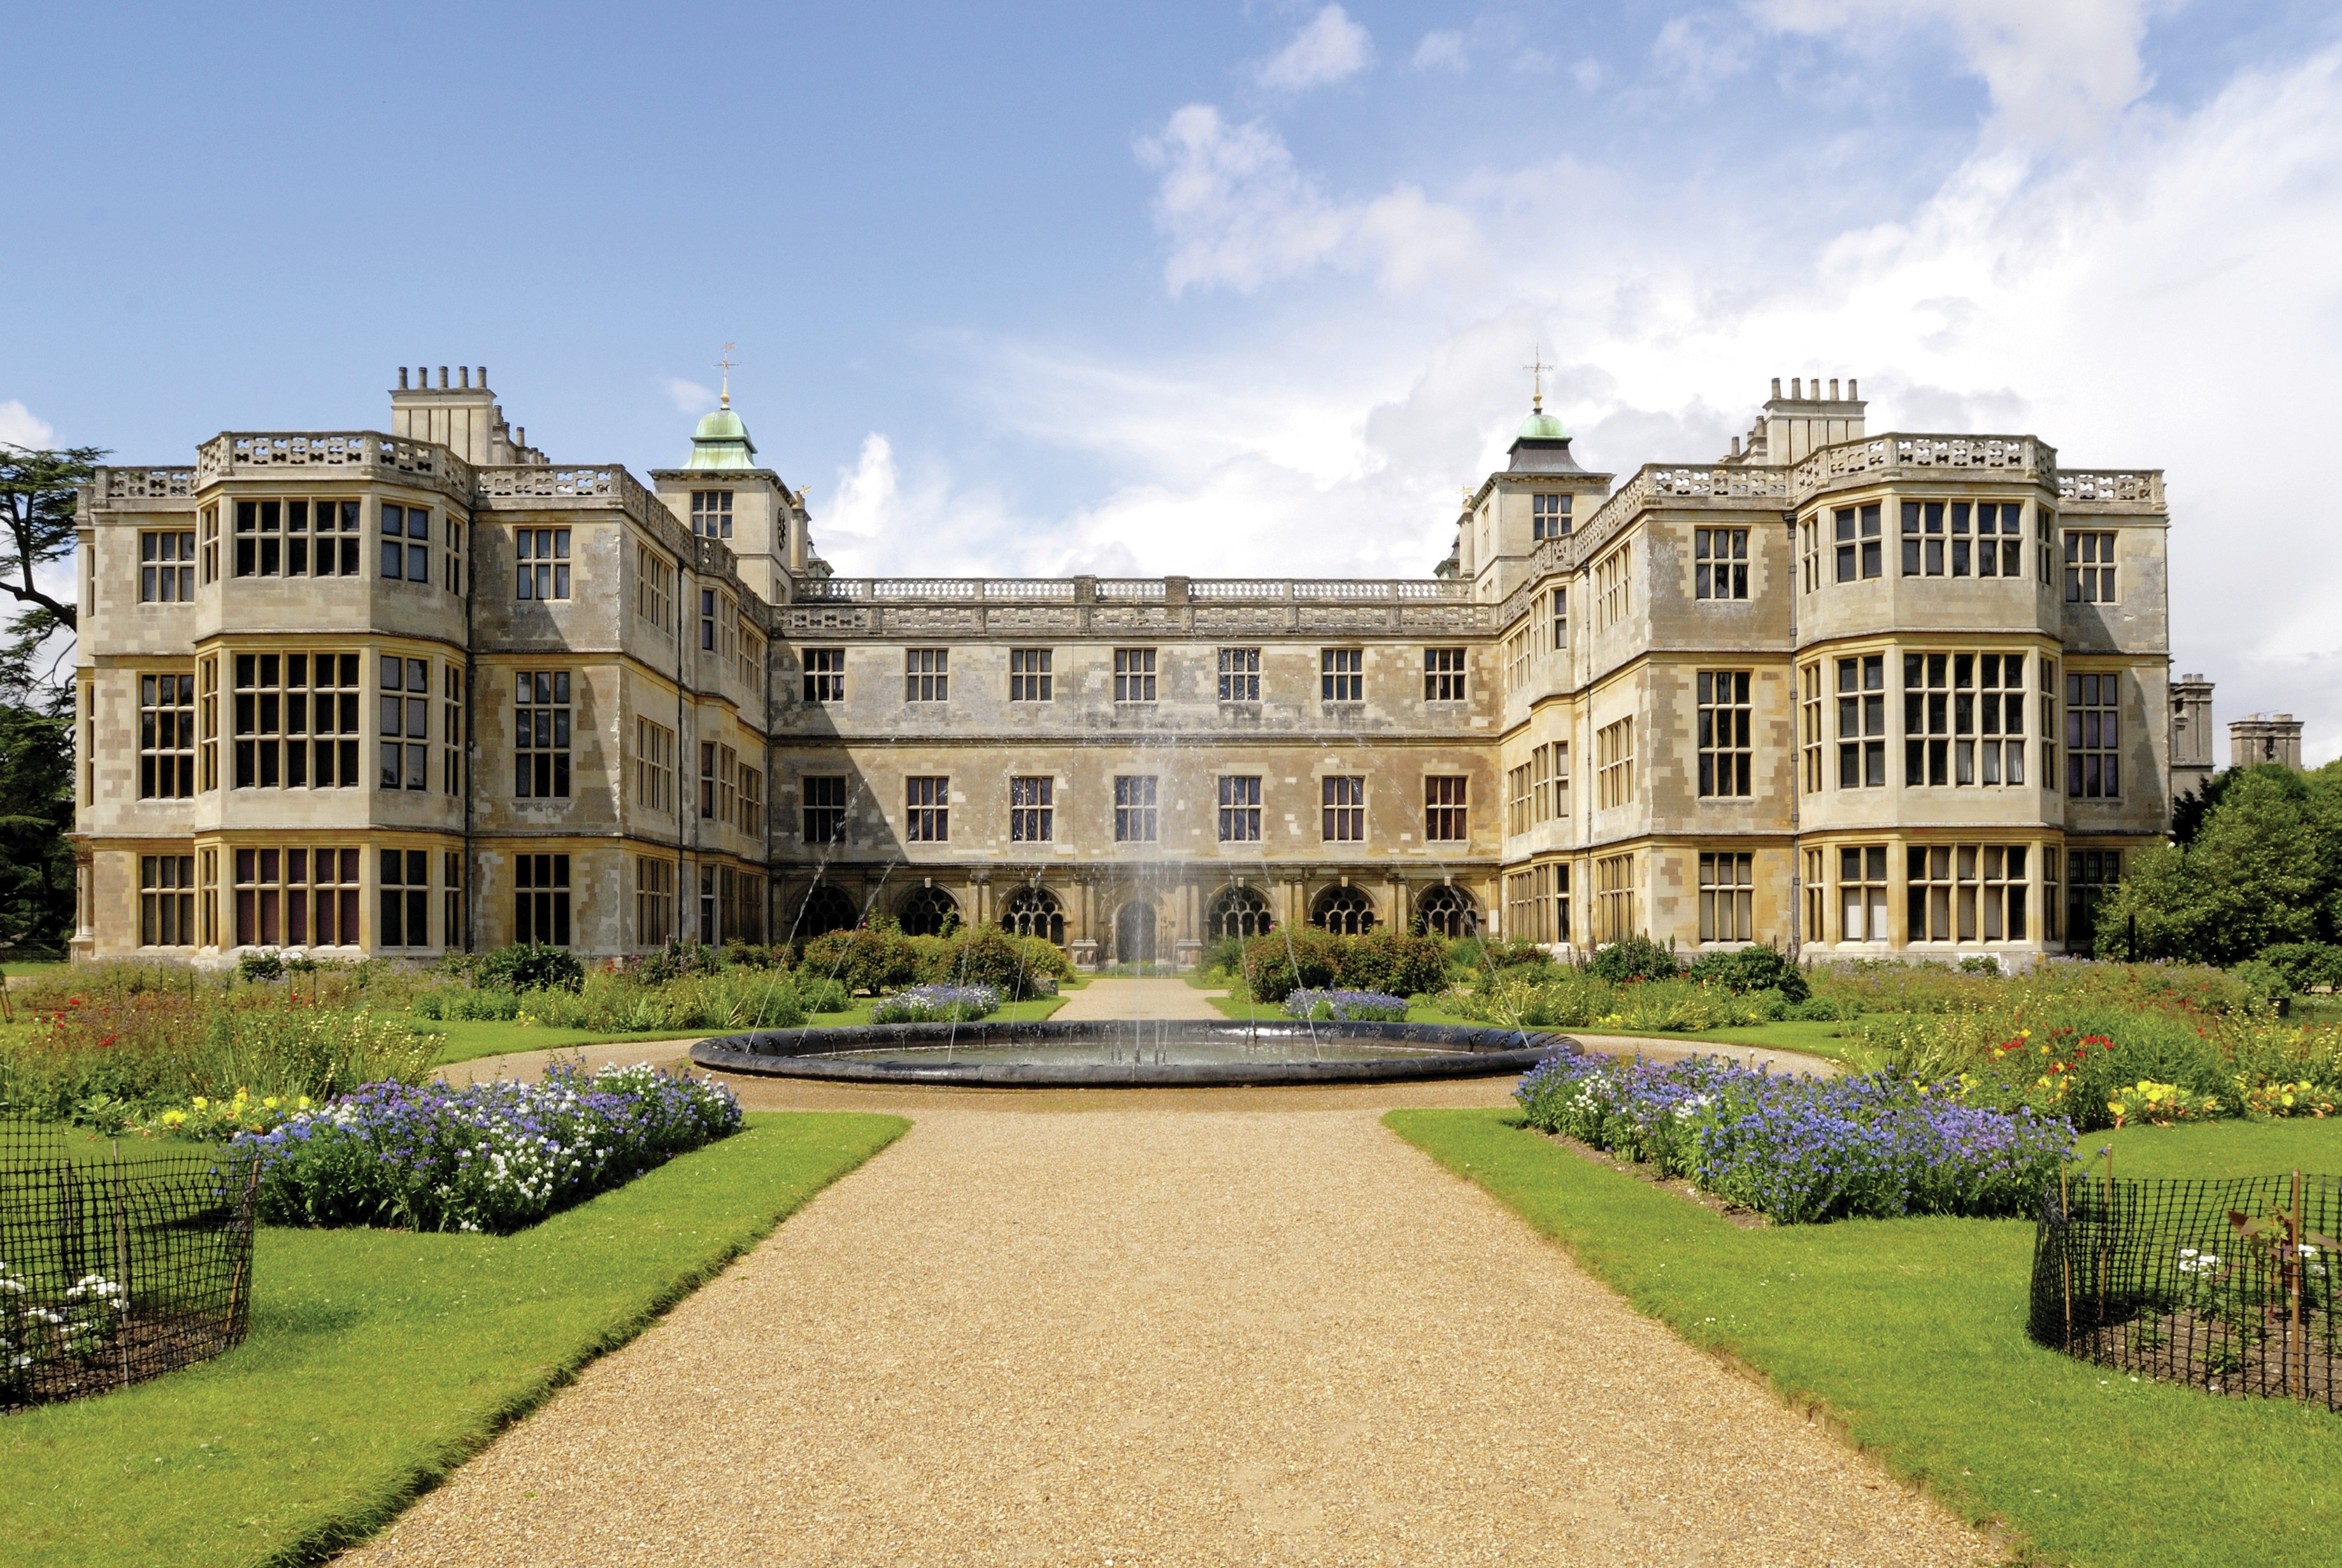 Two English Heritage Senior Memberships Gift Experience